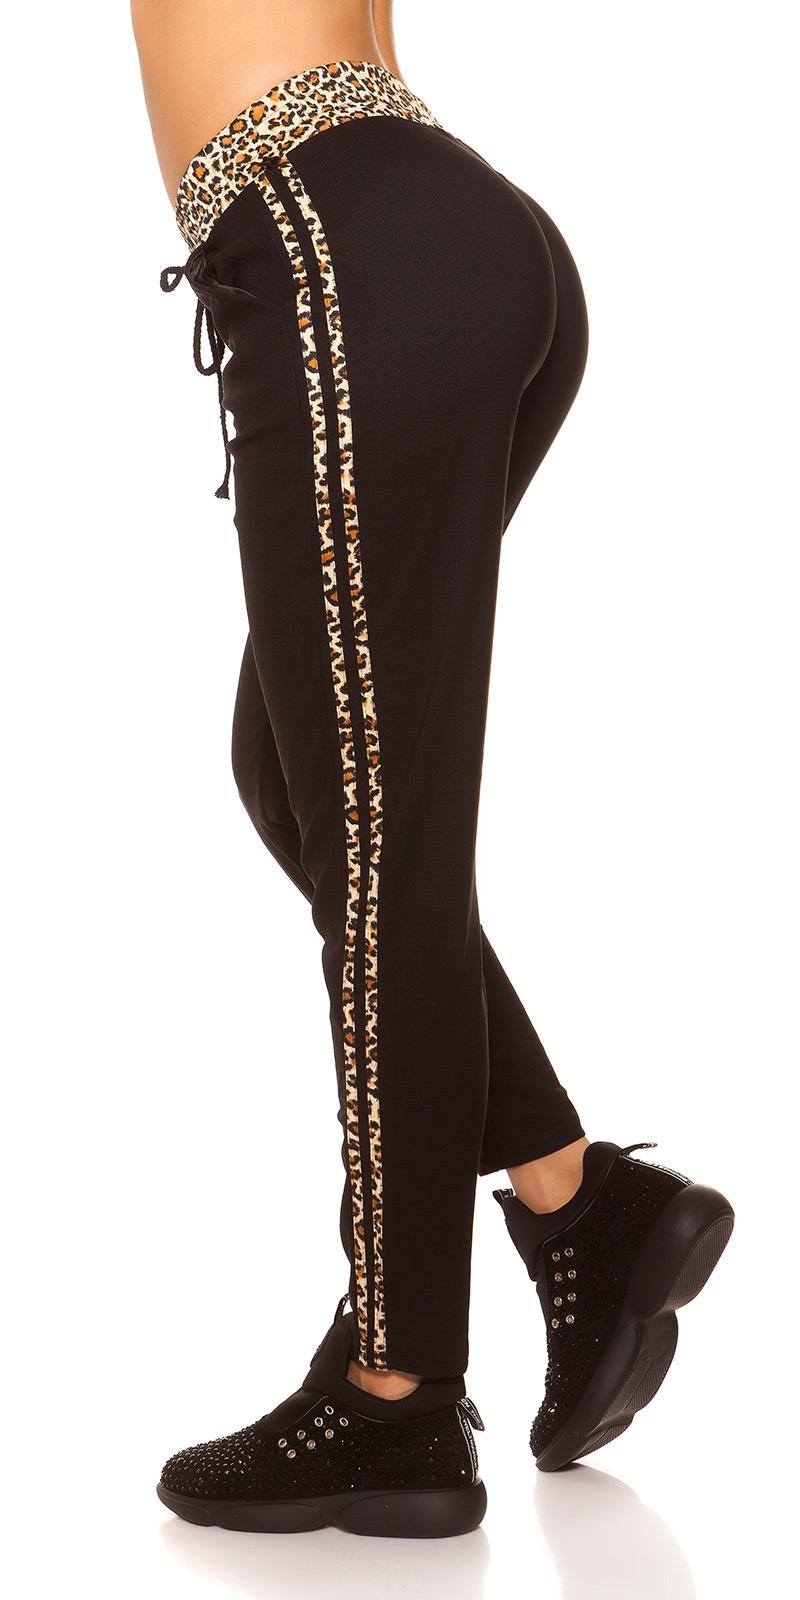 Pantaloni sport la moda cu leopard stripes